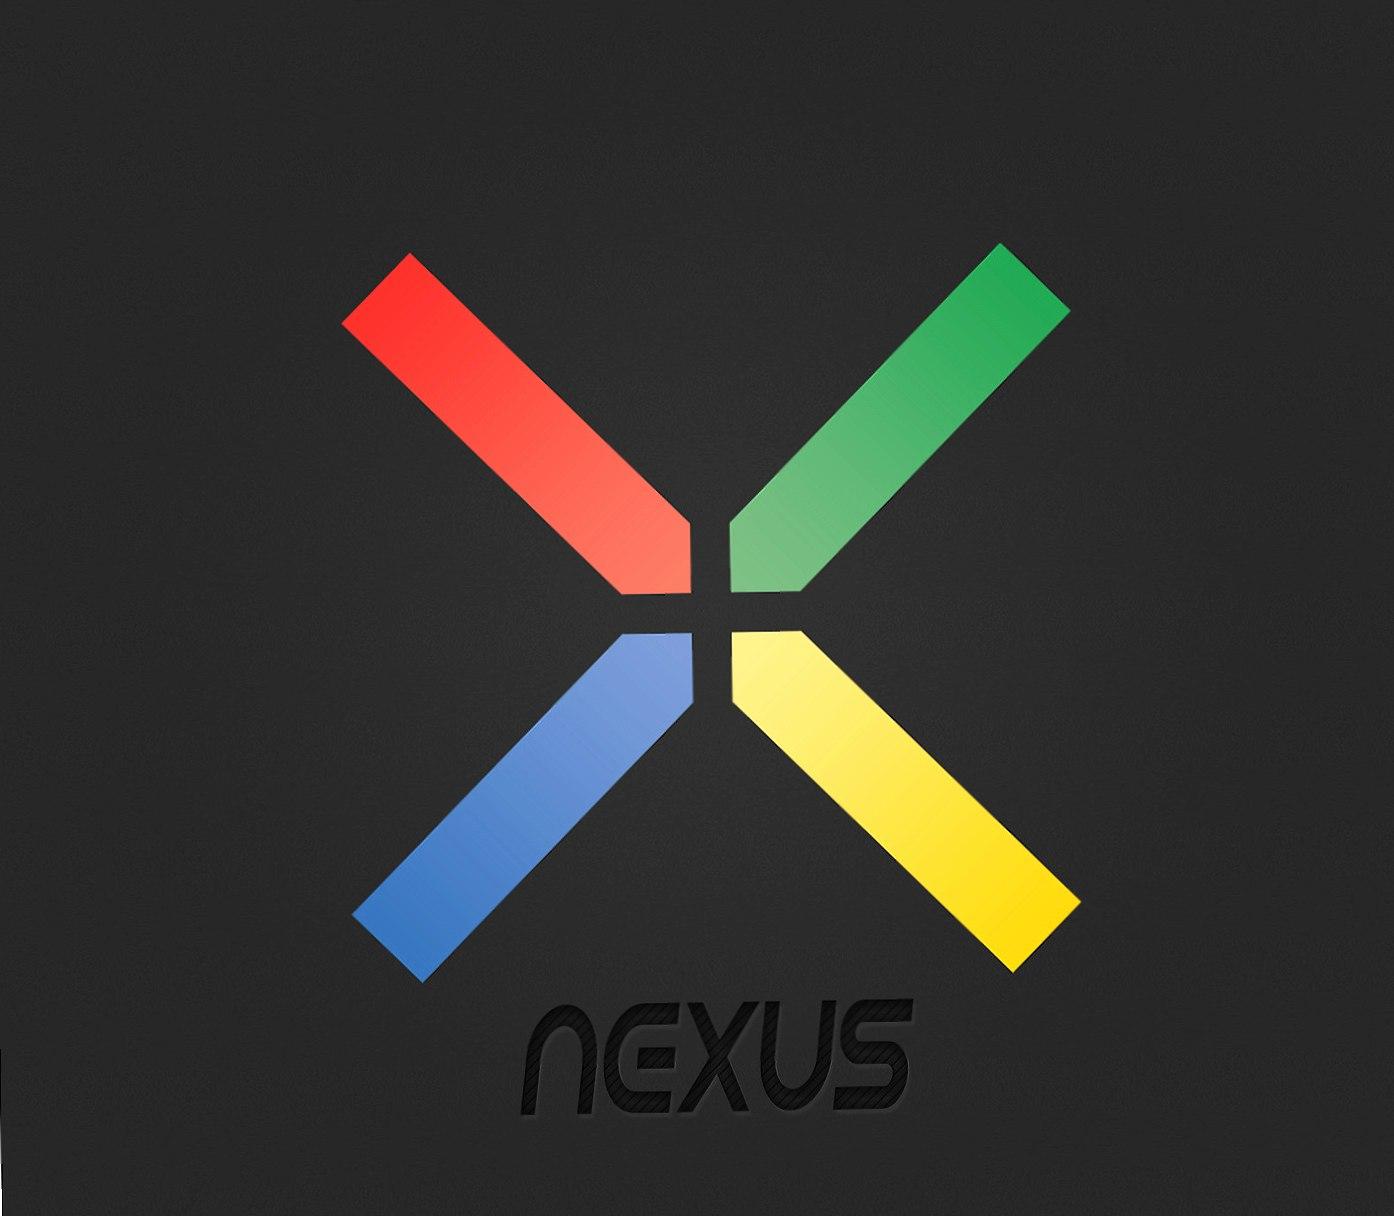 Google Nexus wallpapers HD quality